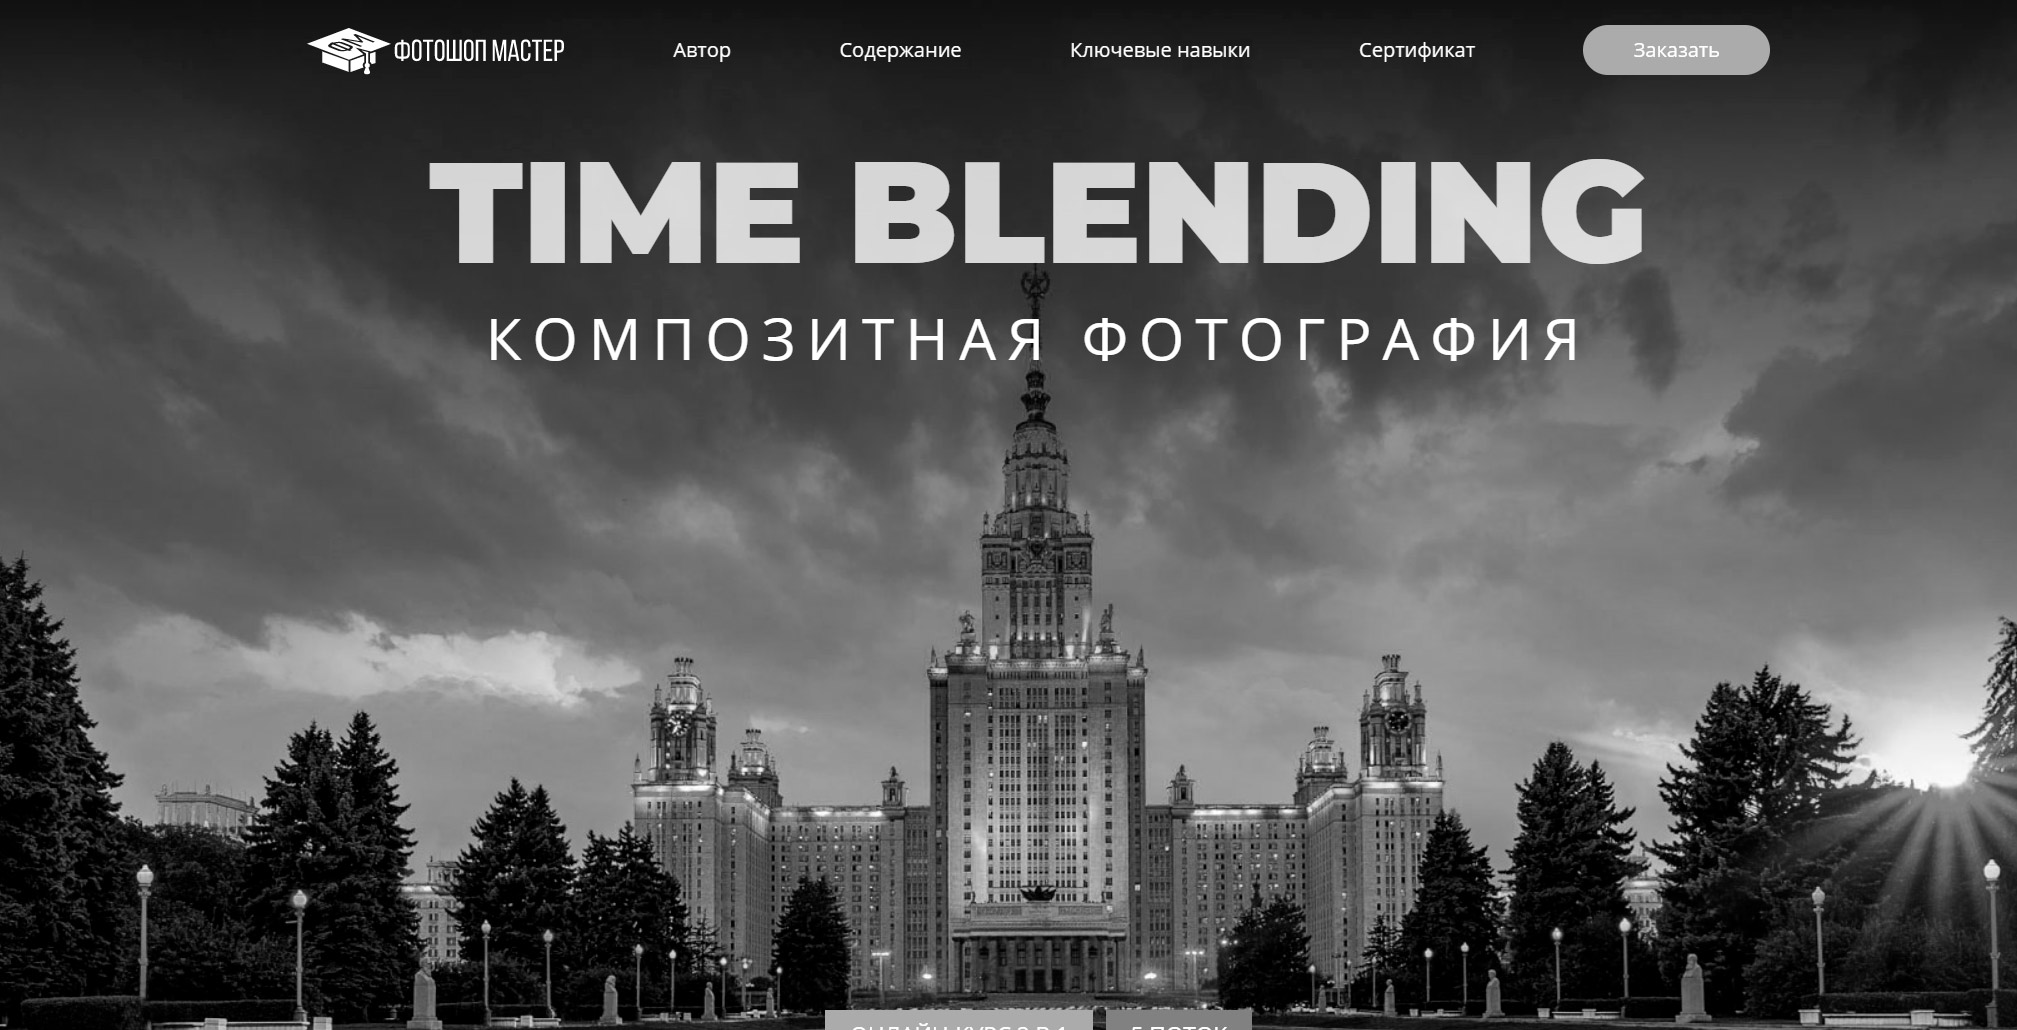 Купон на скидку Time Blending – композитная фотография